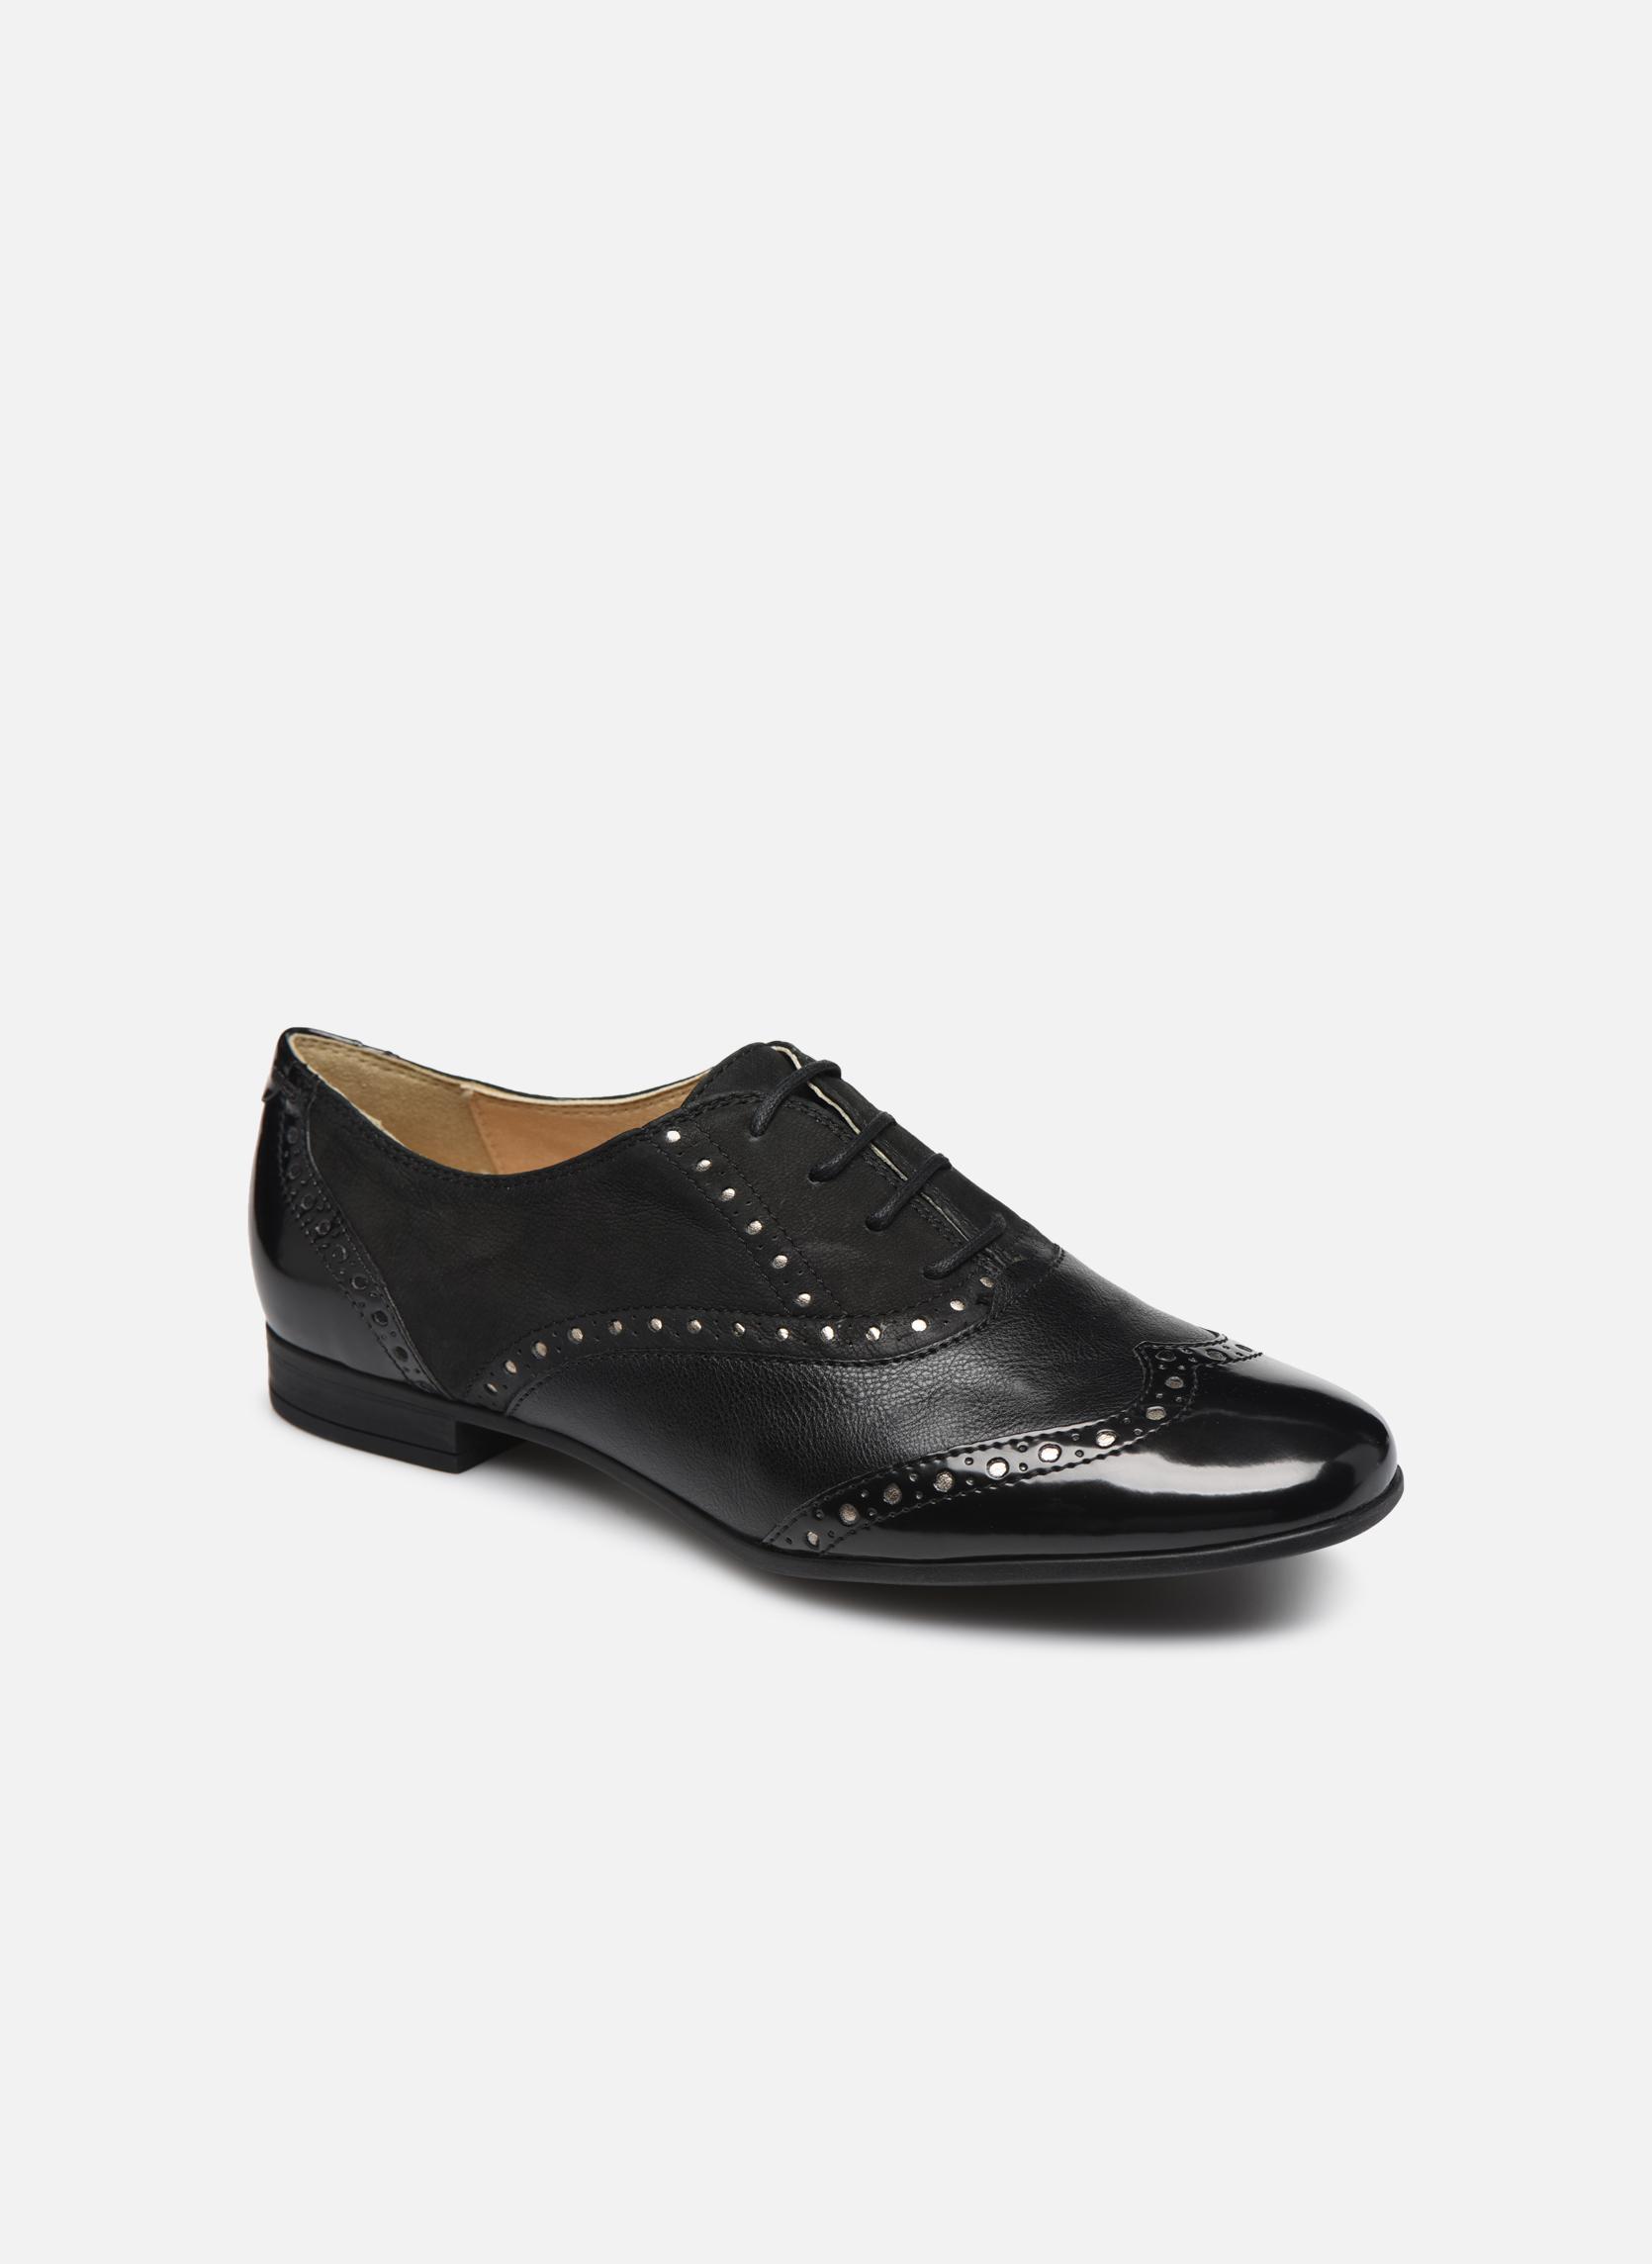 ZapatosGeox (Negro) D MARLYNA C D828PC (Negro) ZapatosGeox - Zapatos con cordones   Venta de liquidación de temporada 4d0672